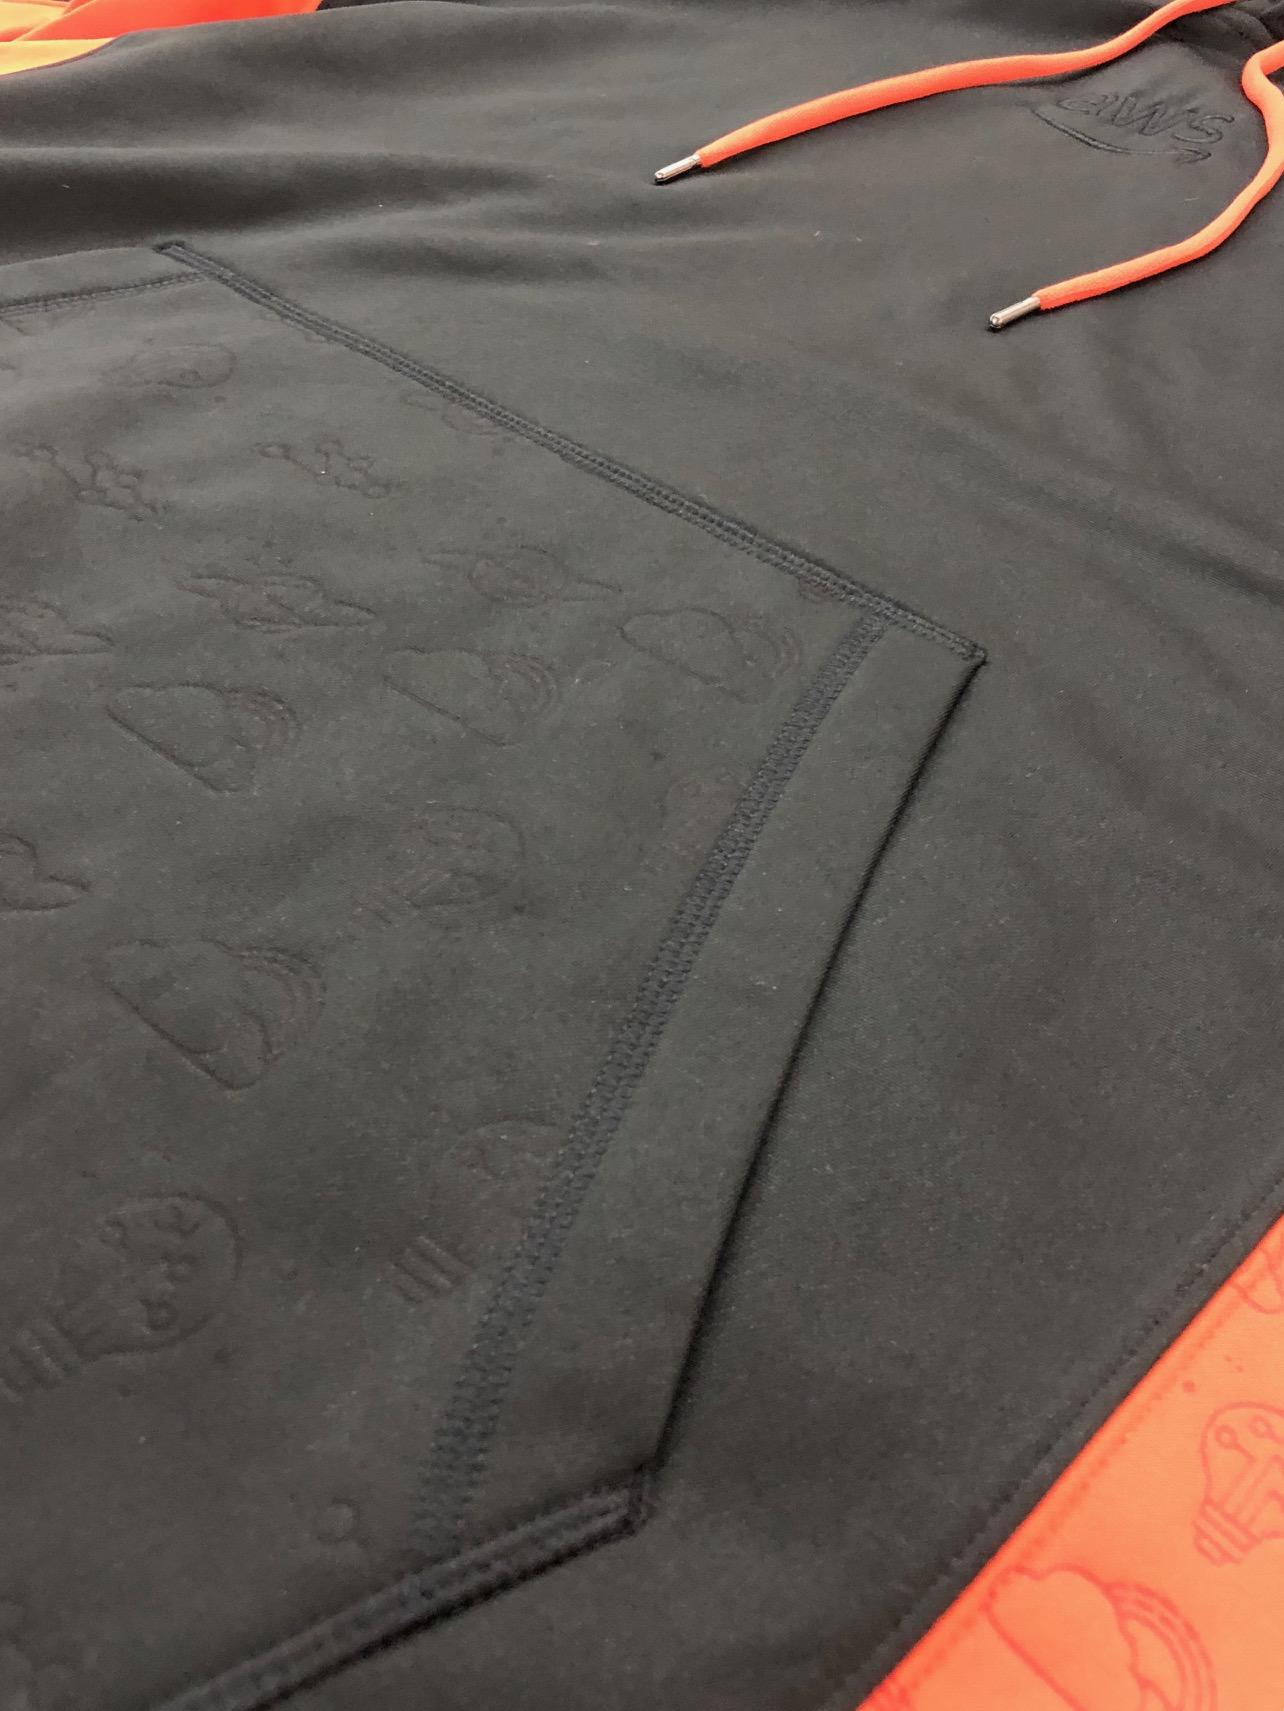 logounltd_laser_etching_embroidery_screen_printing_apparel_uniform_custom_tshirts_dye_sublimation_kirkland_bellevue_seattle_redmond_branded_merchandise_promotional_products_logo_unltd_amazon_aws (12).jpg